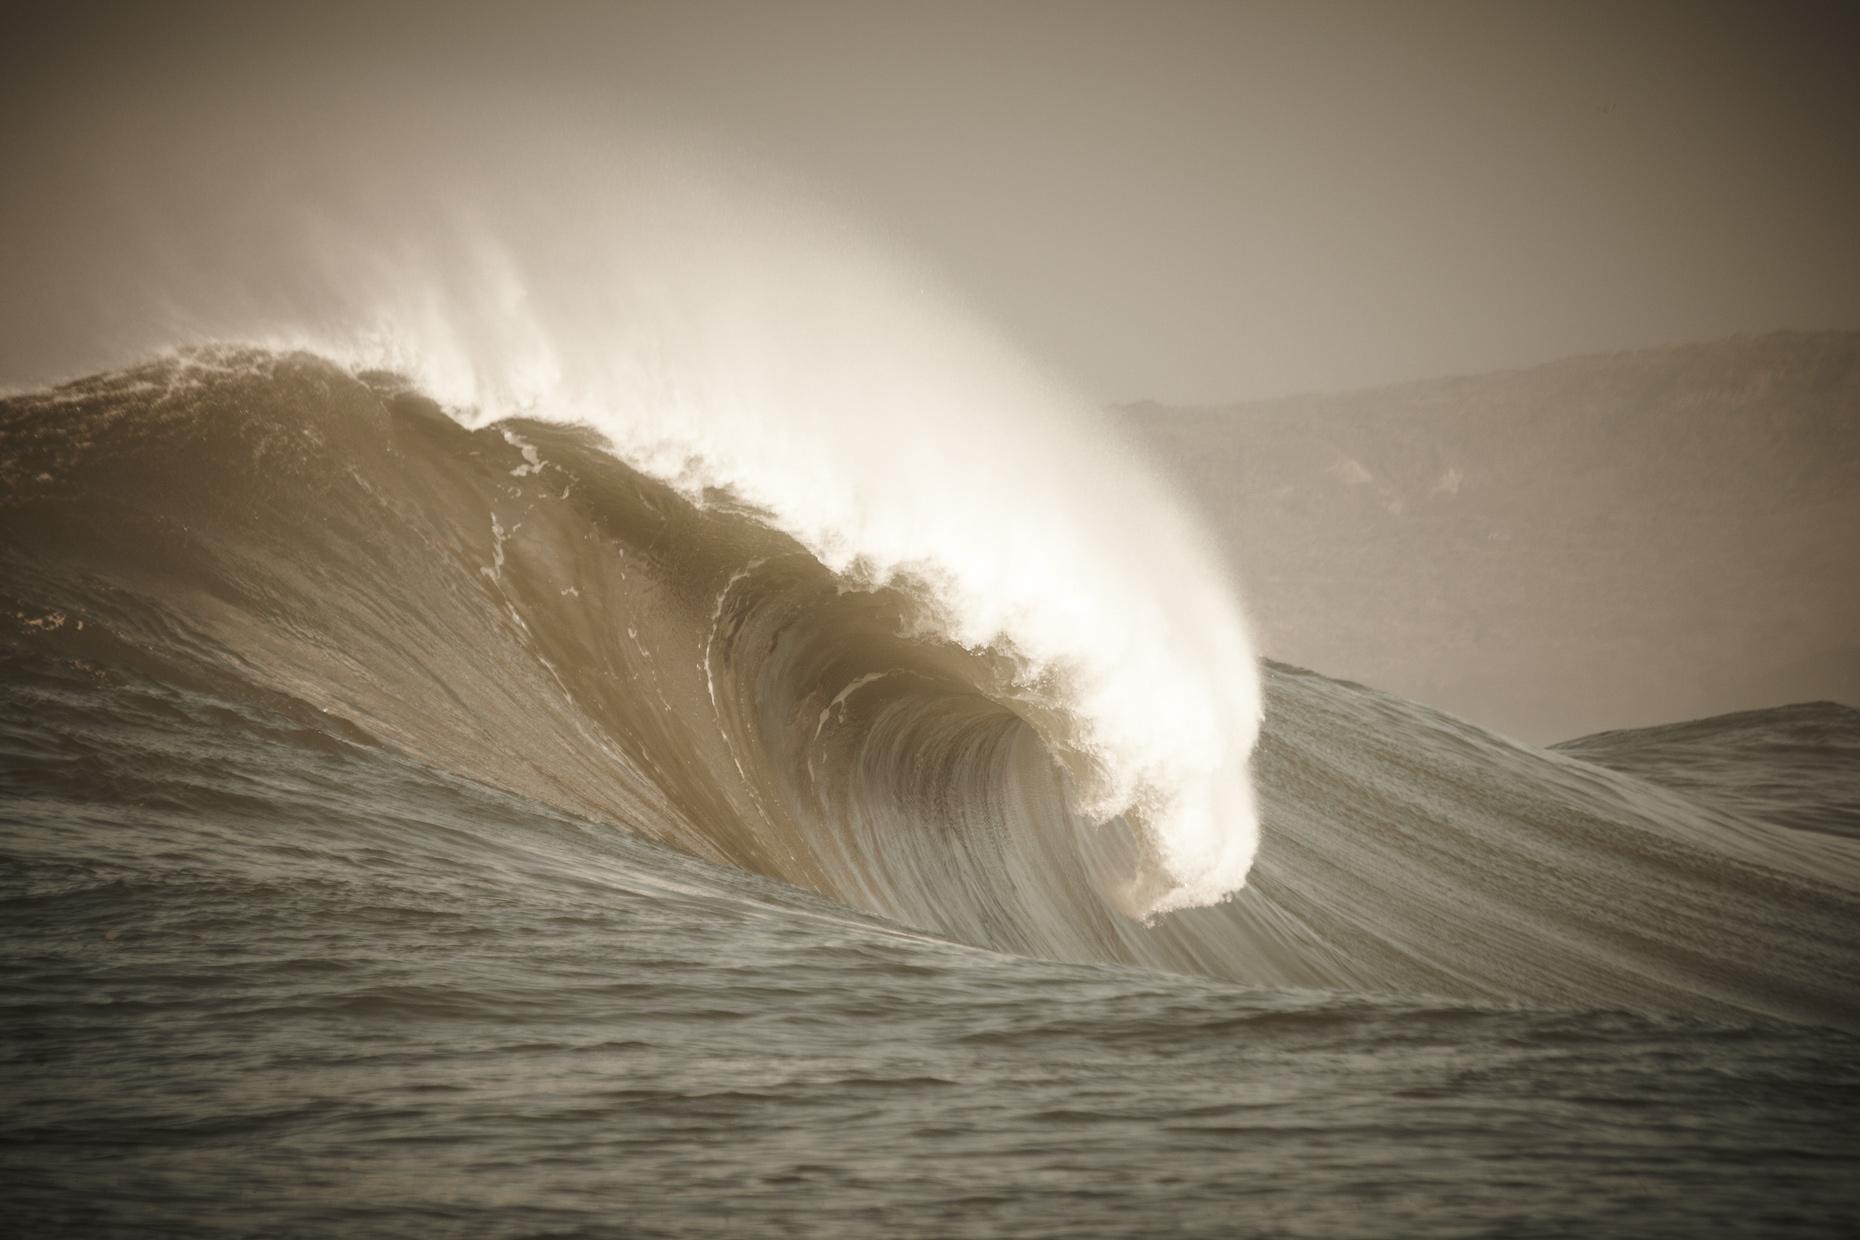 Projects Action Photography Derek Israelsen 007 Ocean Wave